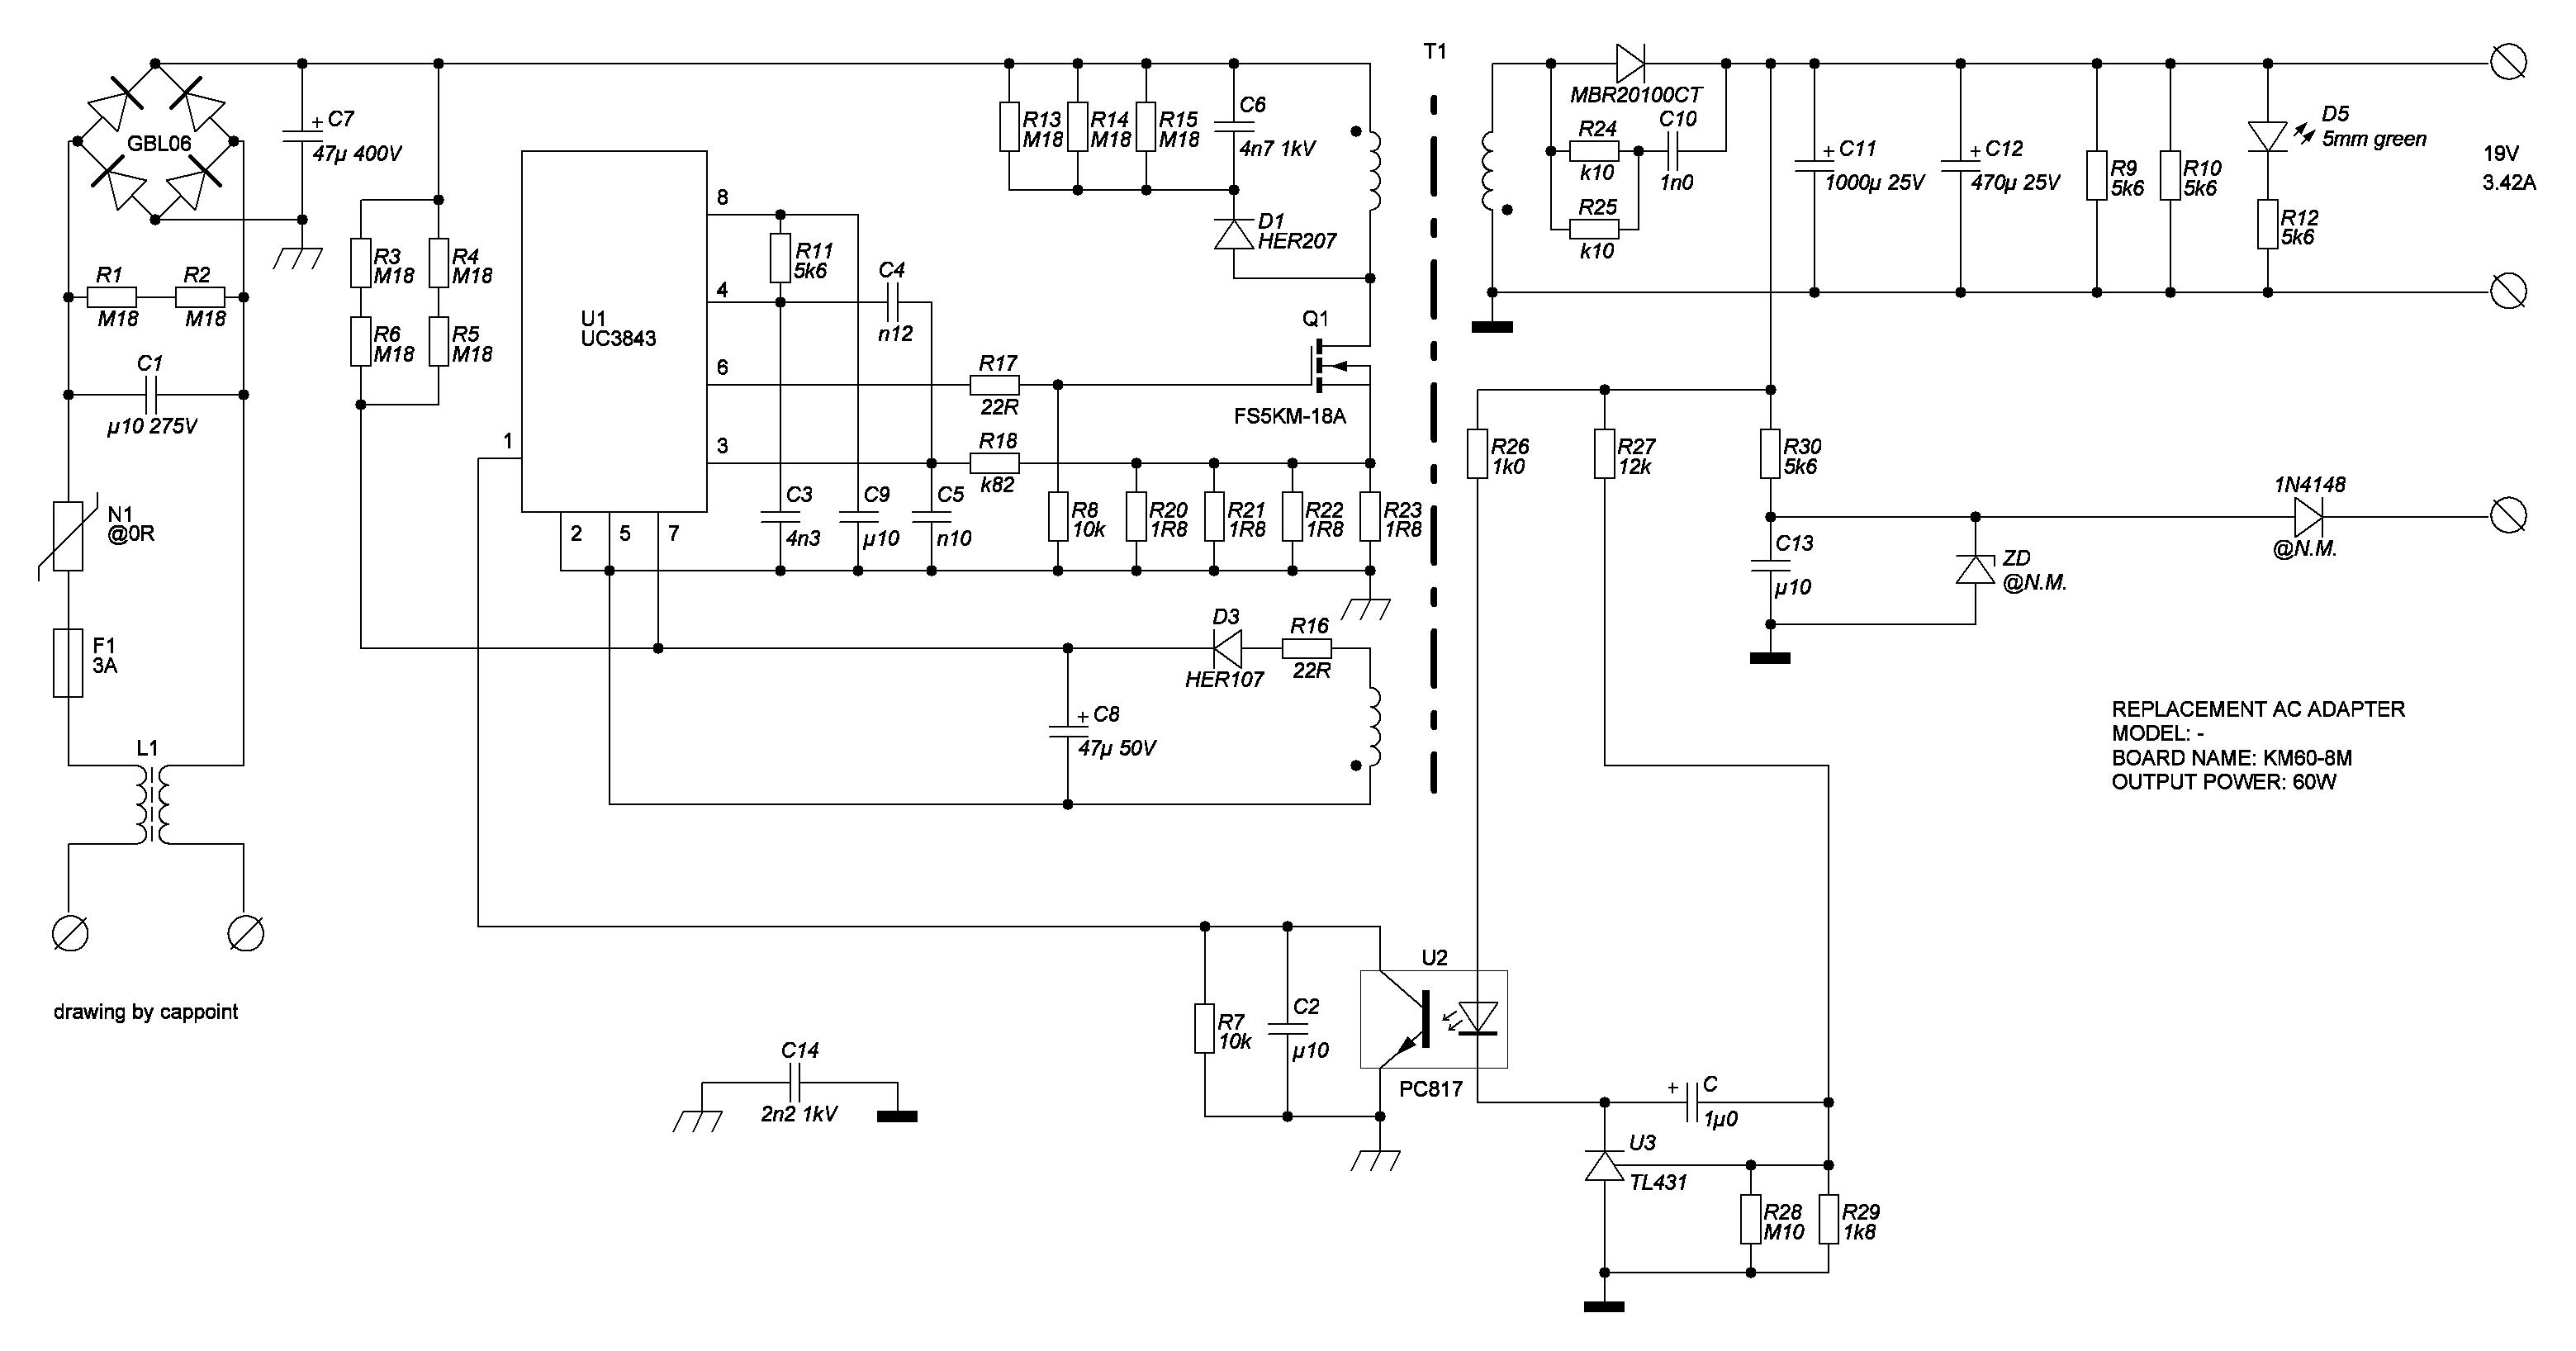 unit 27 m3 and d1